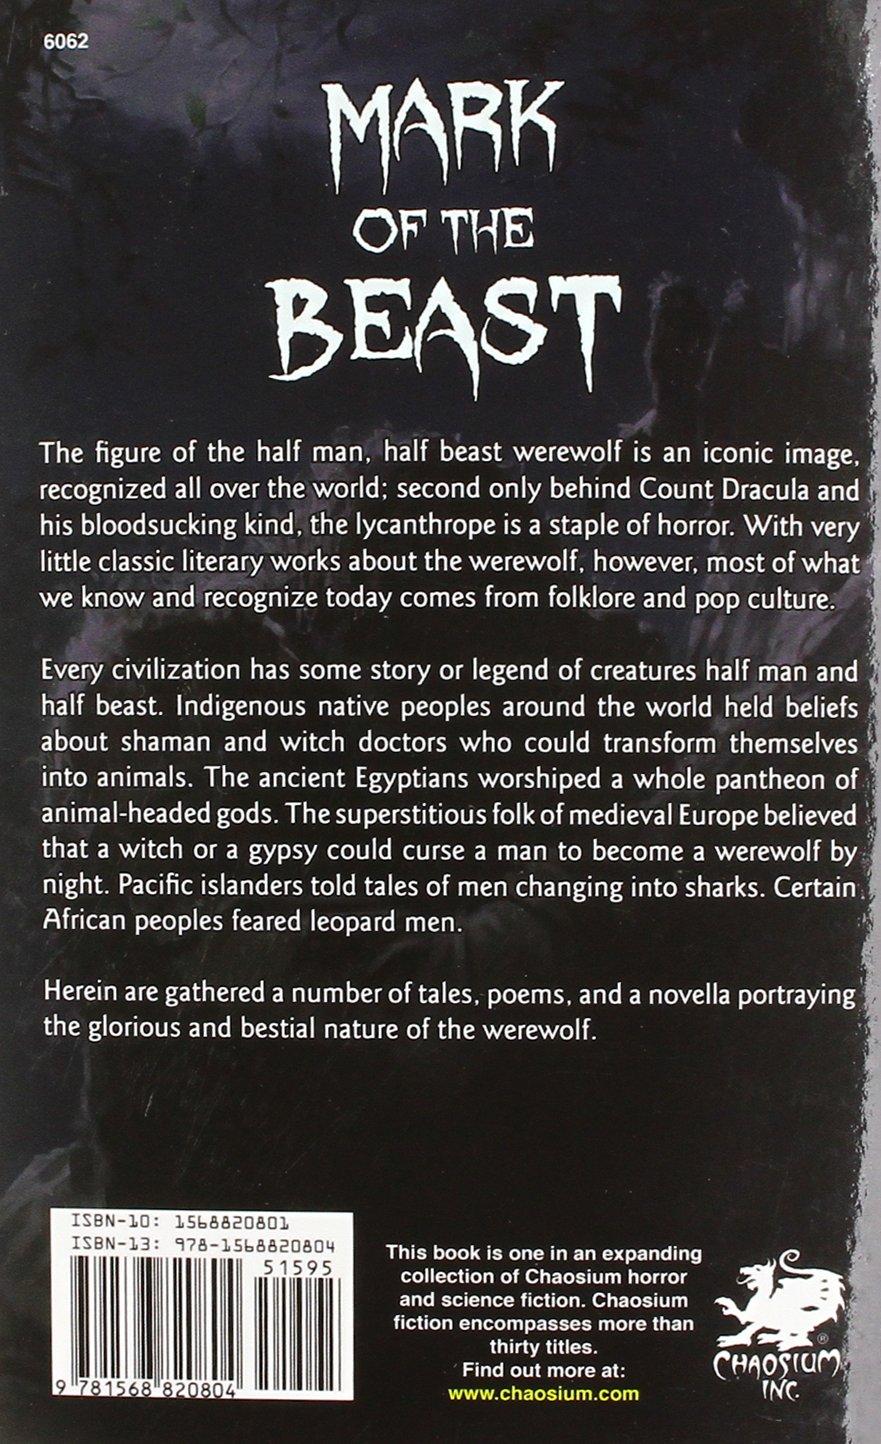 Mark of the Beast: Scott David Aniolowski: 9781568820804